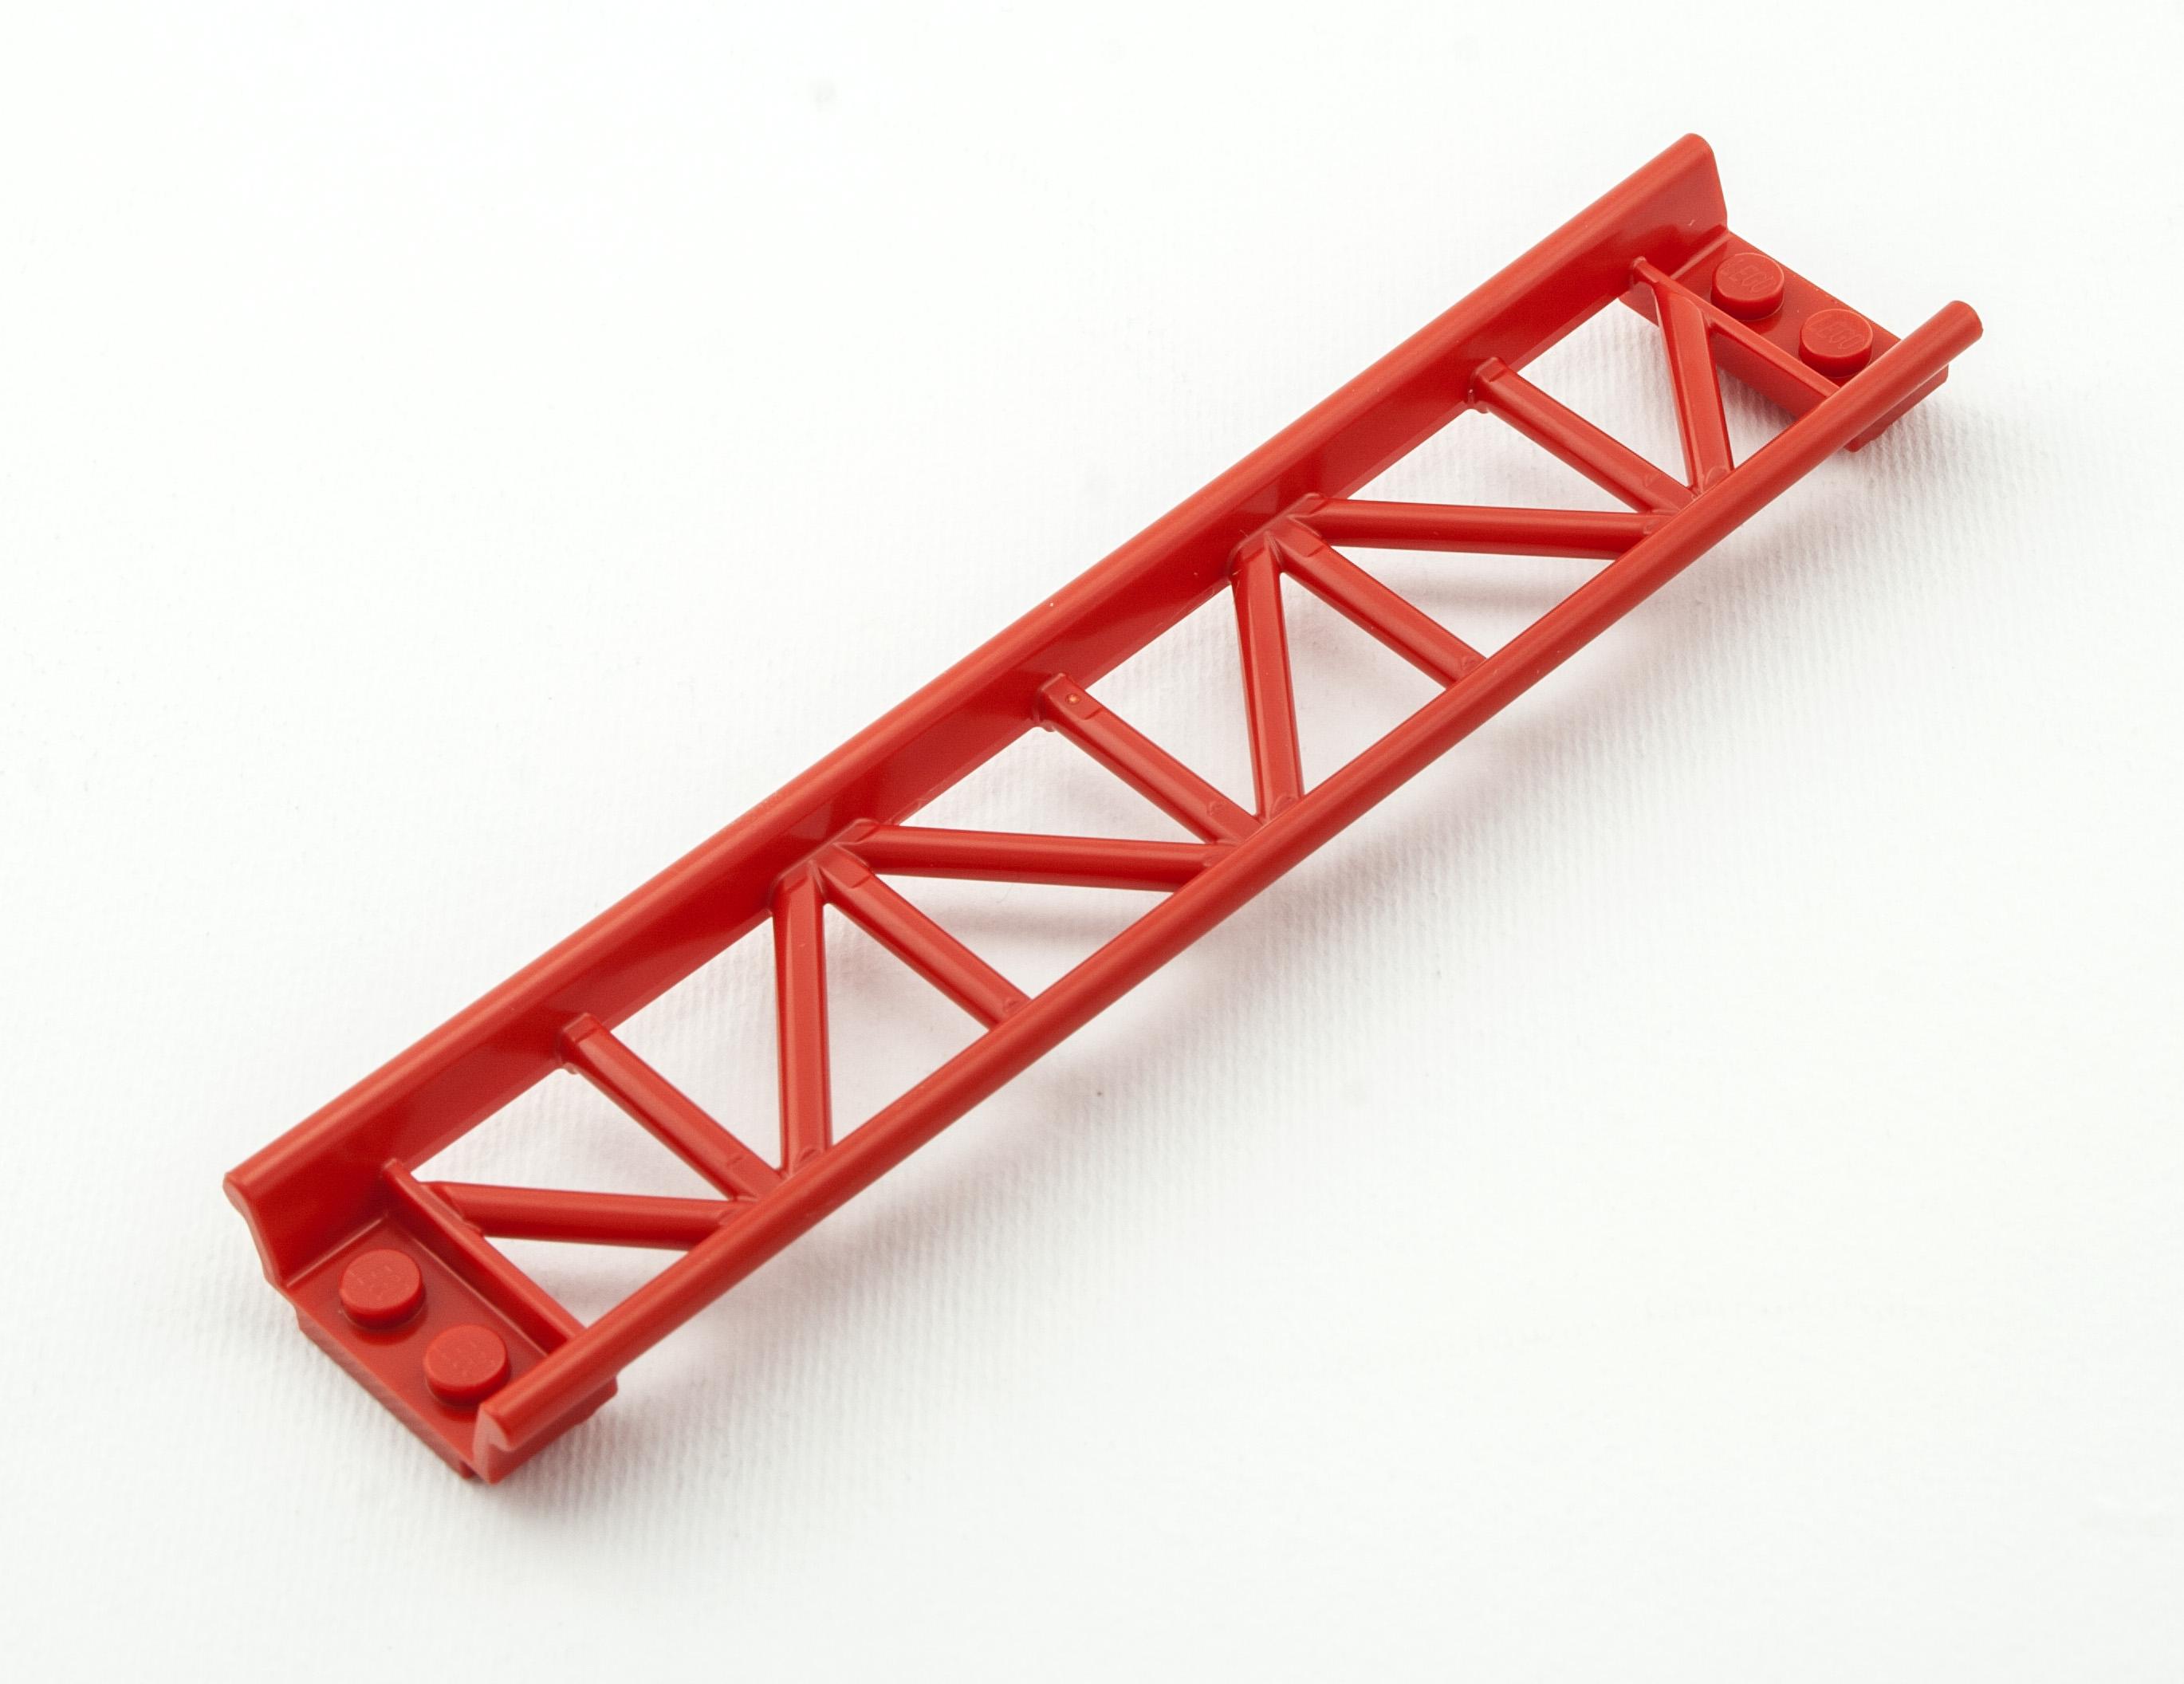 Review - LEGO 10261 Roller Coaster | Rebrickable - Build